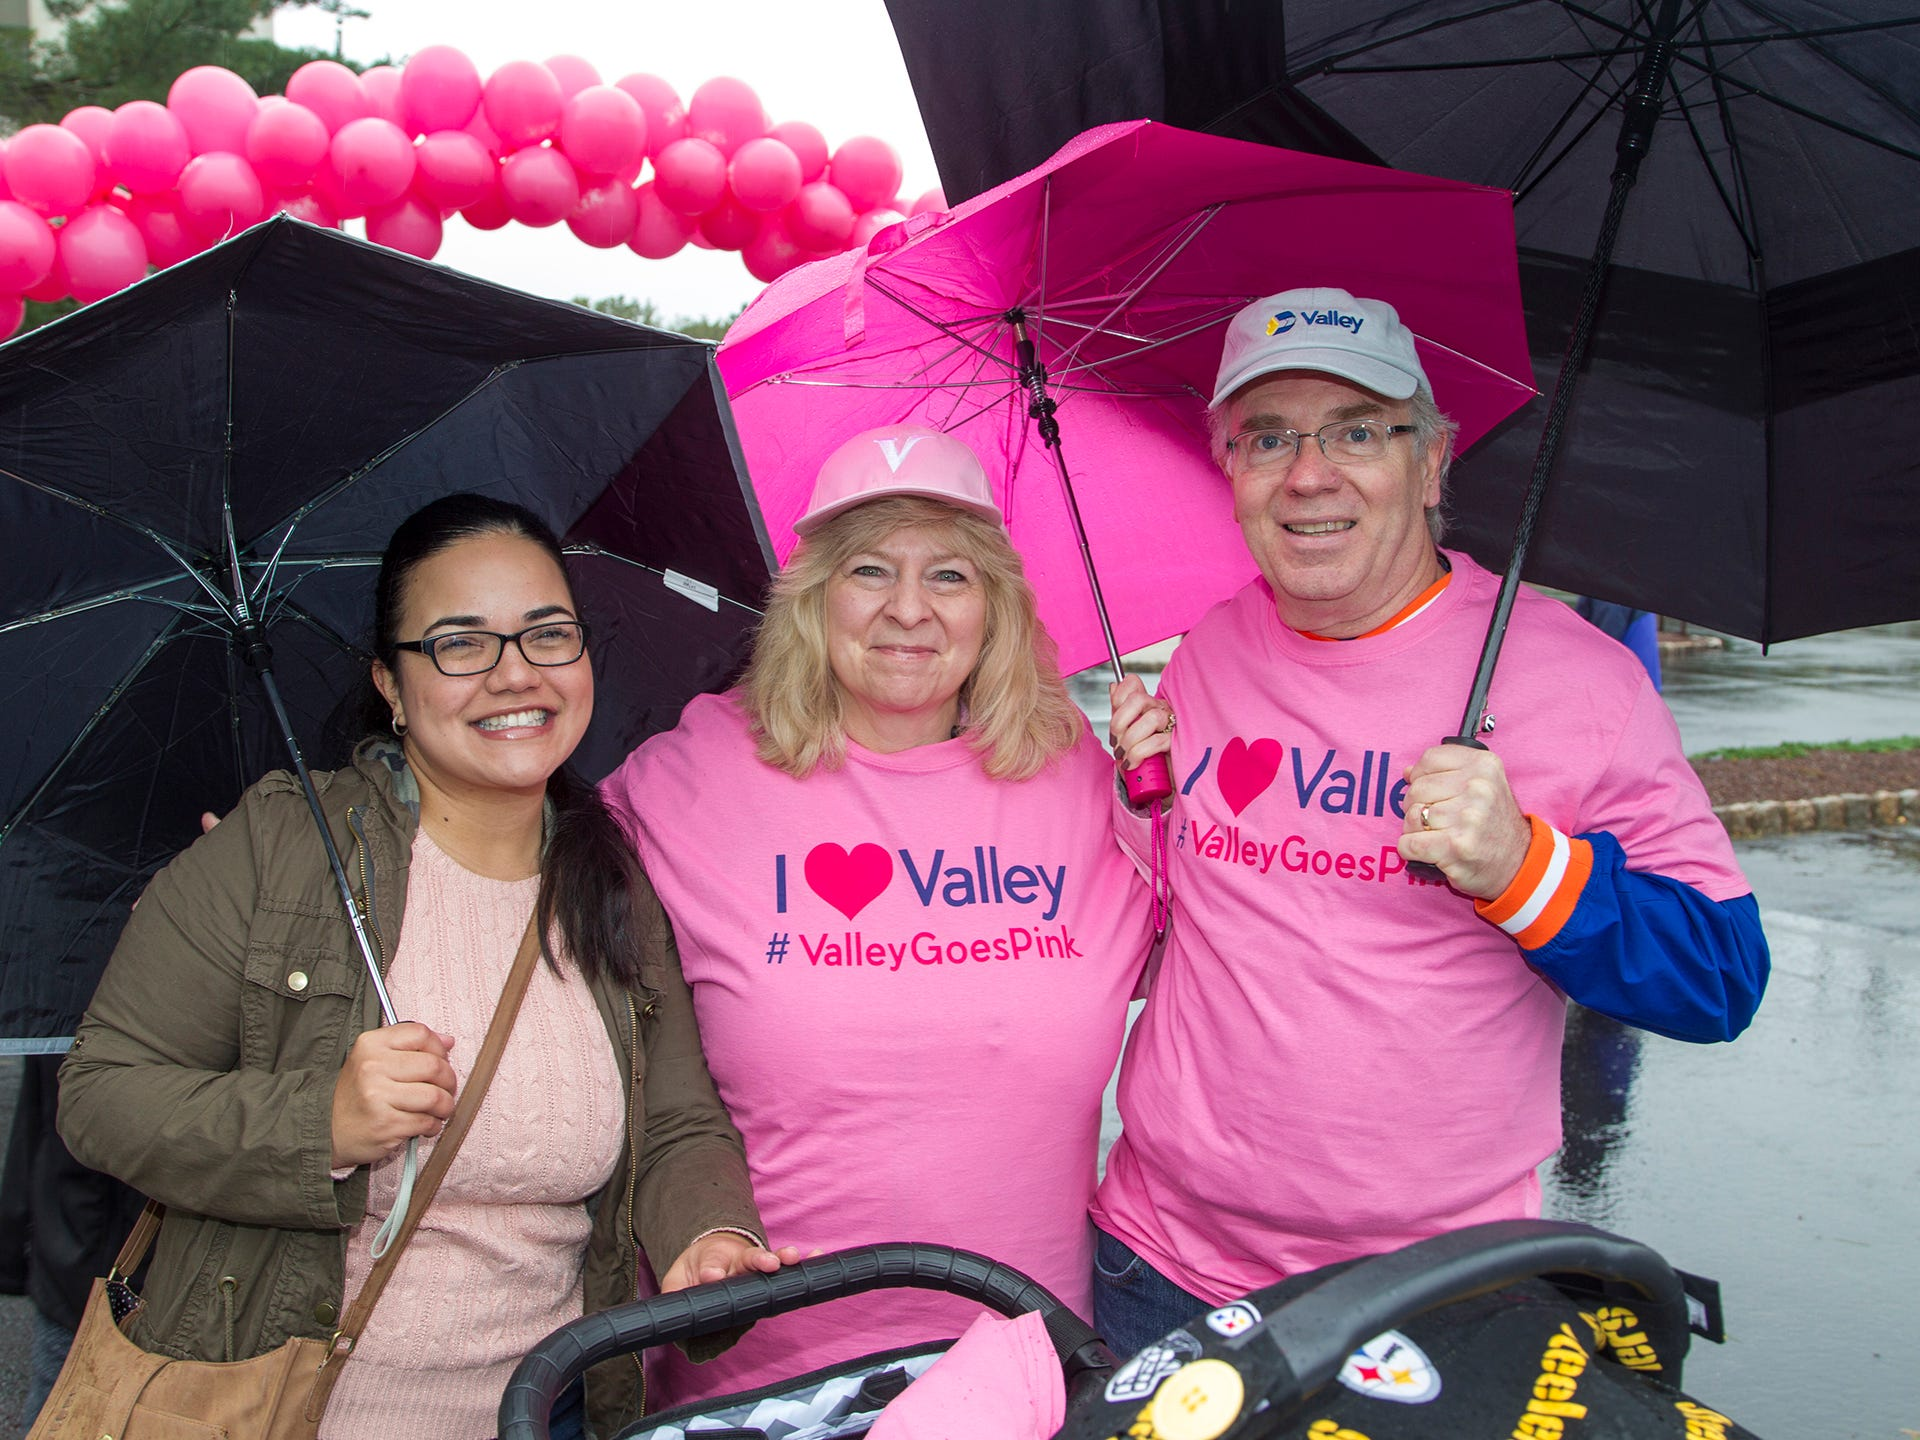 Jaclena Matoss, Debbie Mackey, Edward Mackey. Valley National Bank held its 10th annual Breast Cancer Walk in Wayne. 10/13/2018